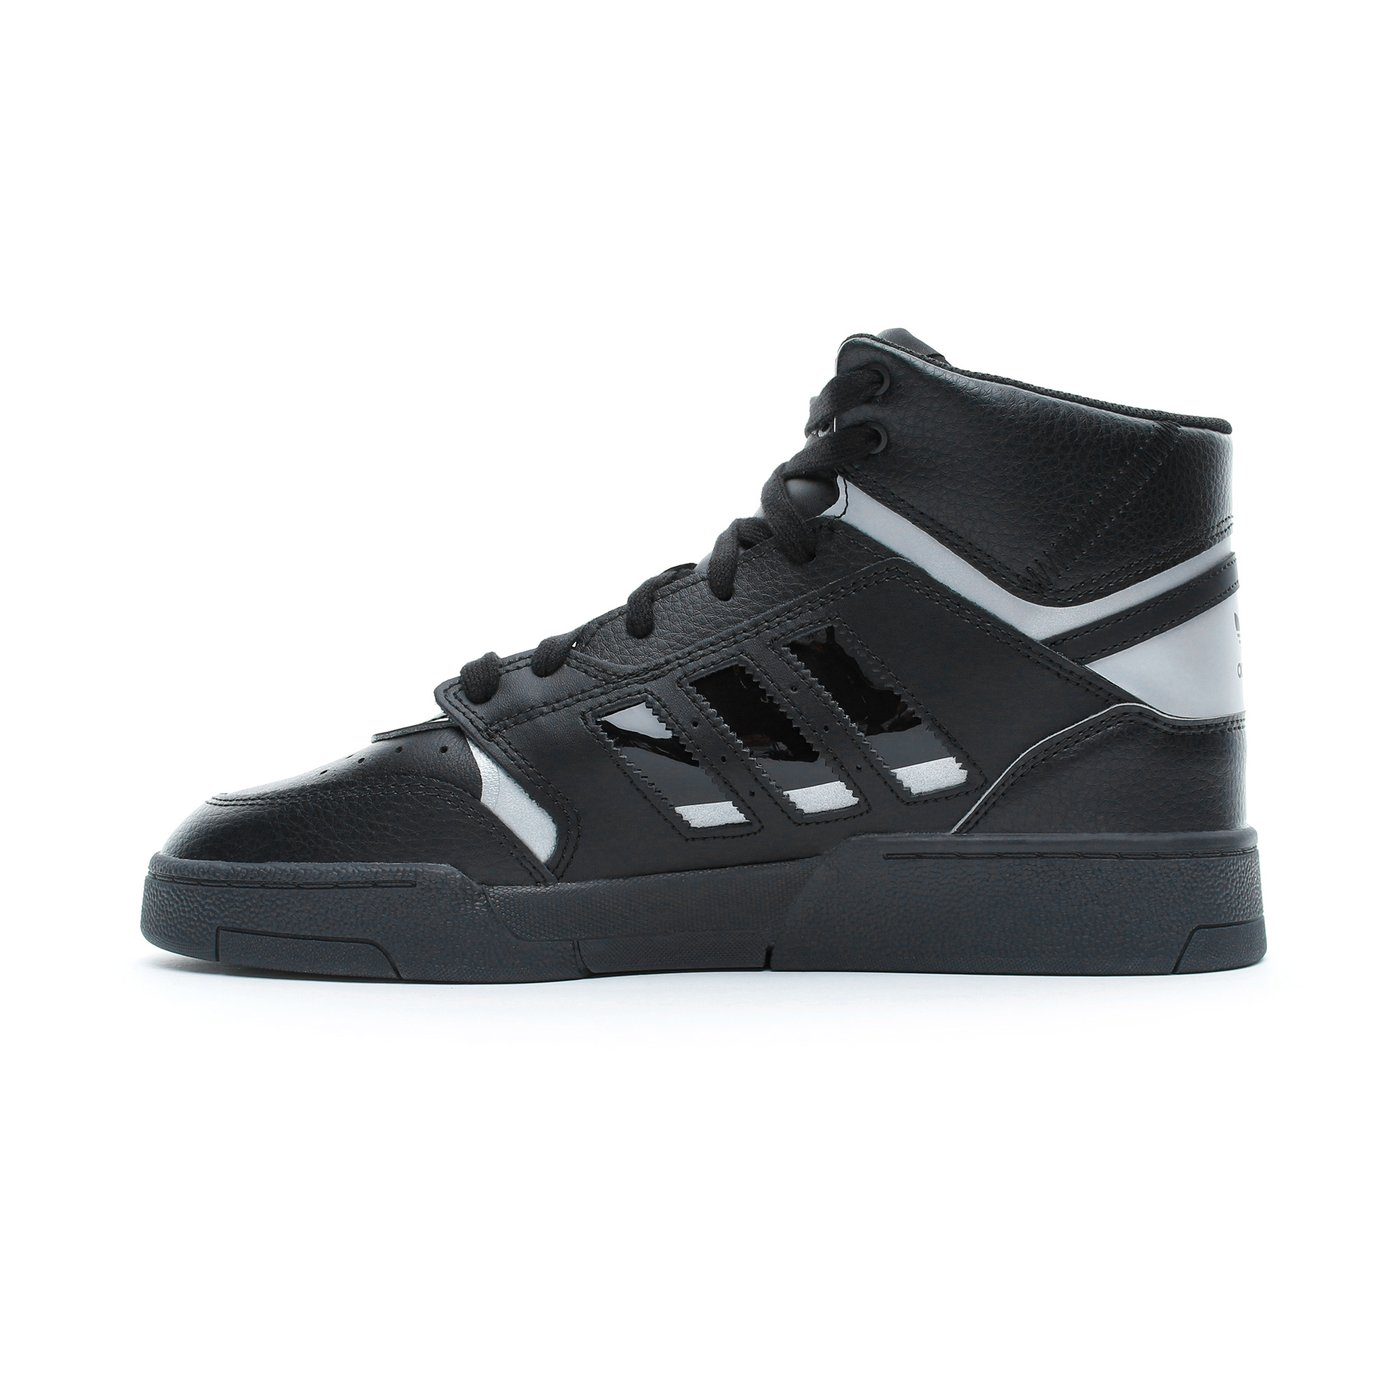 adidas Drop Step Erkek Siyah Spor Ayakkabı